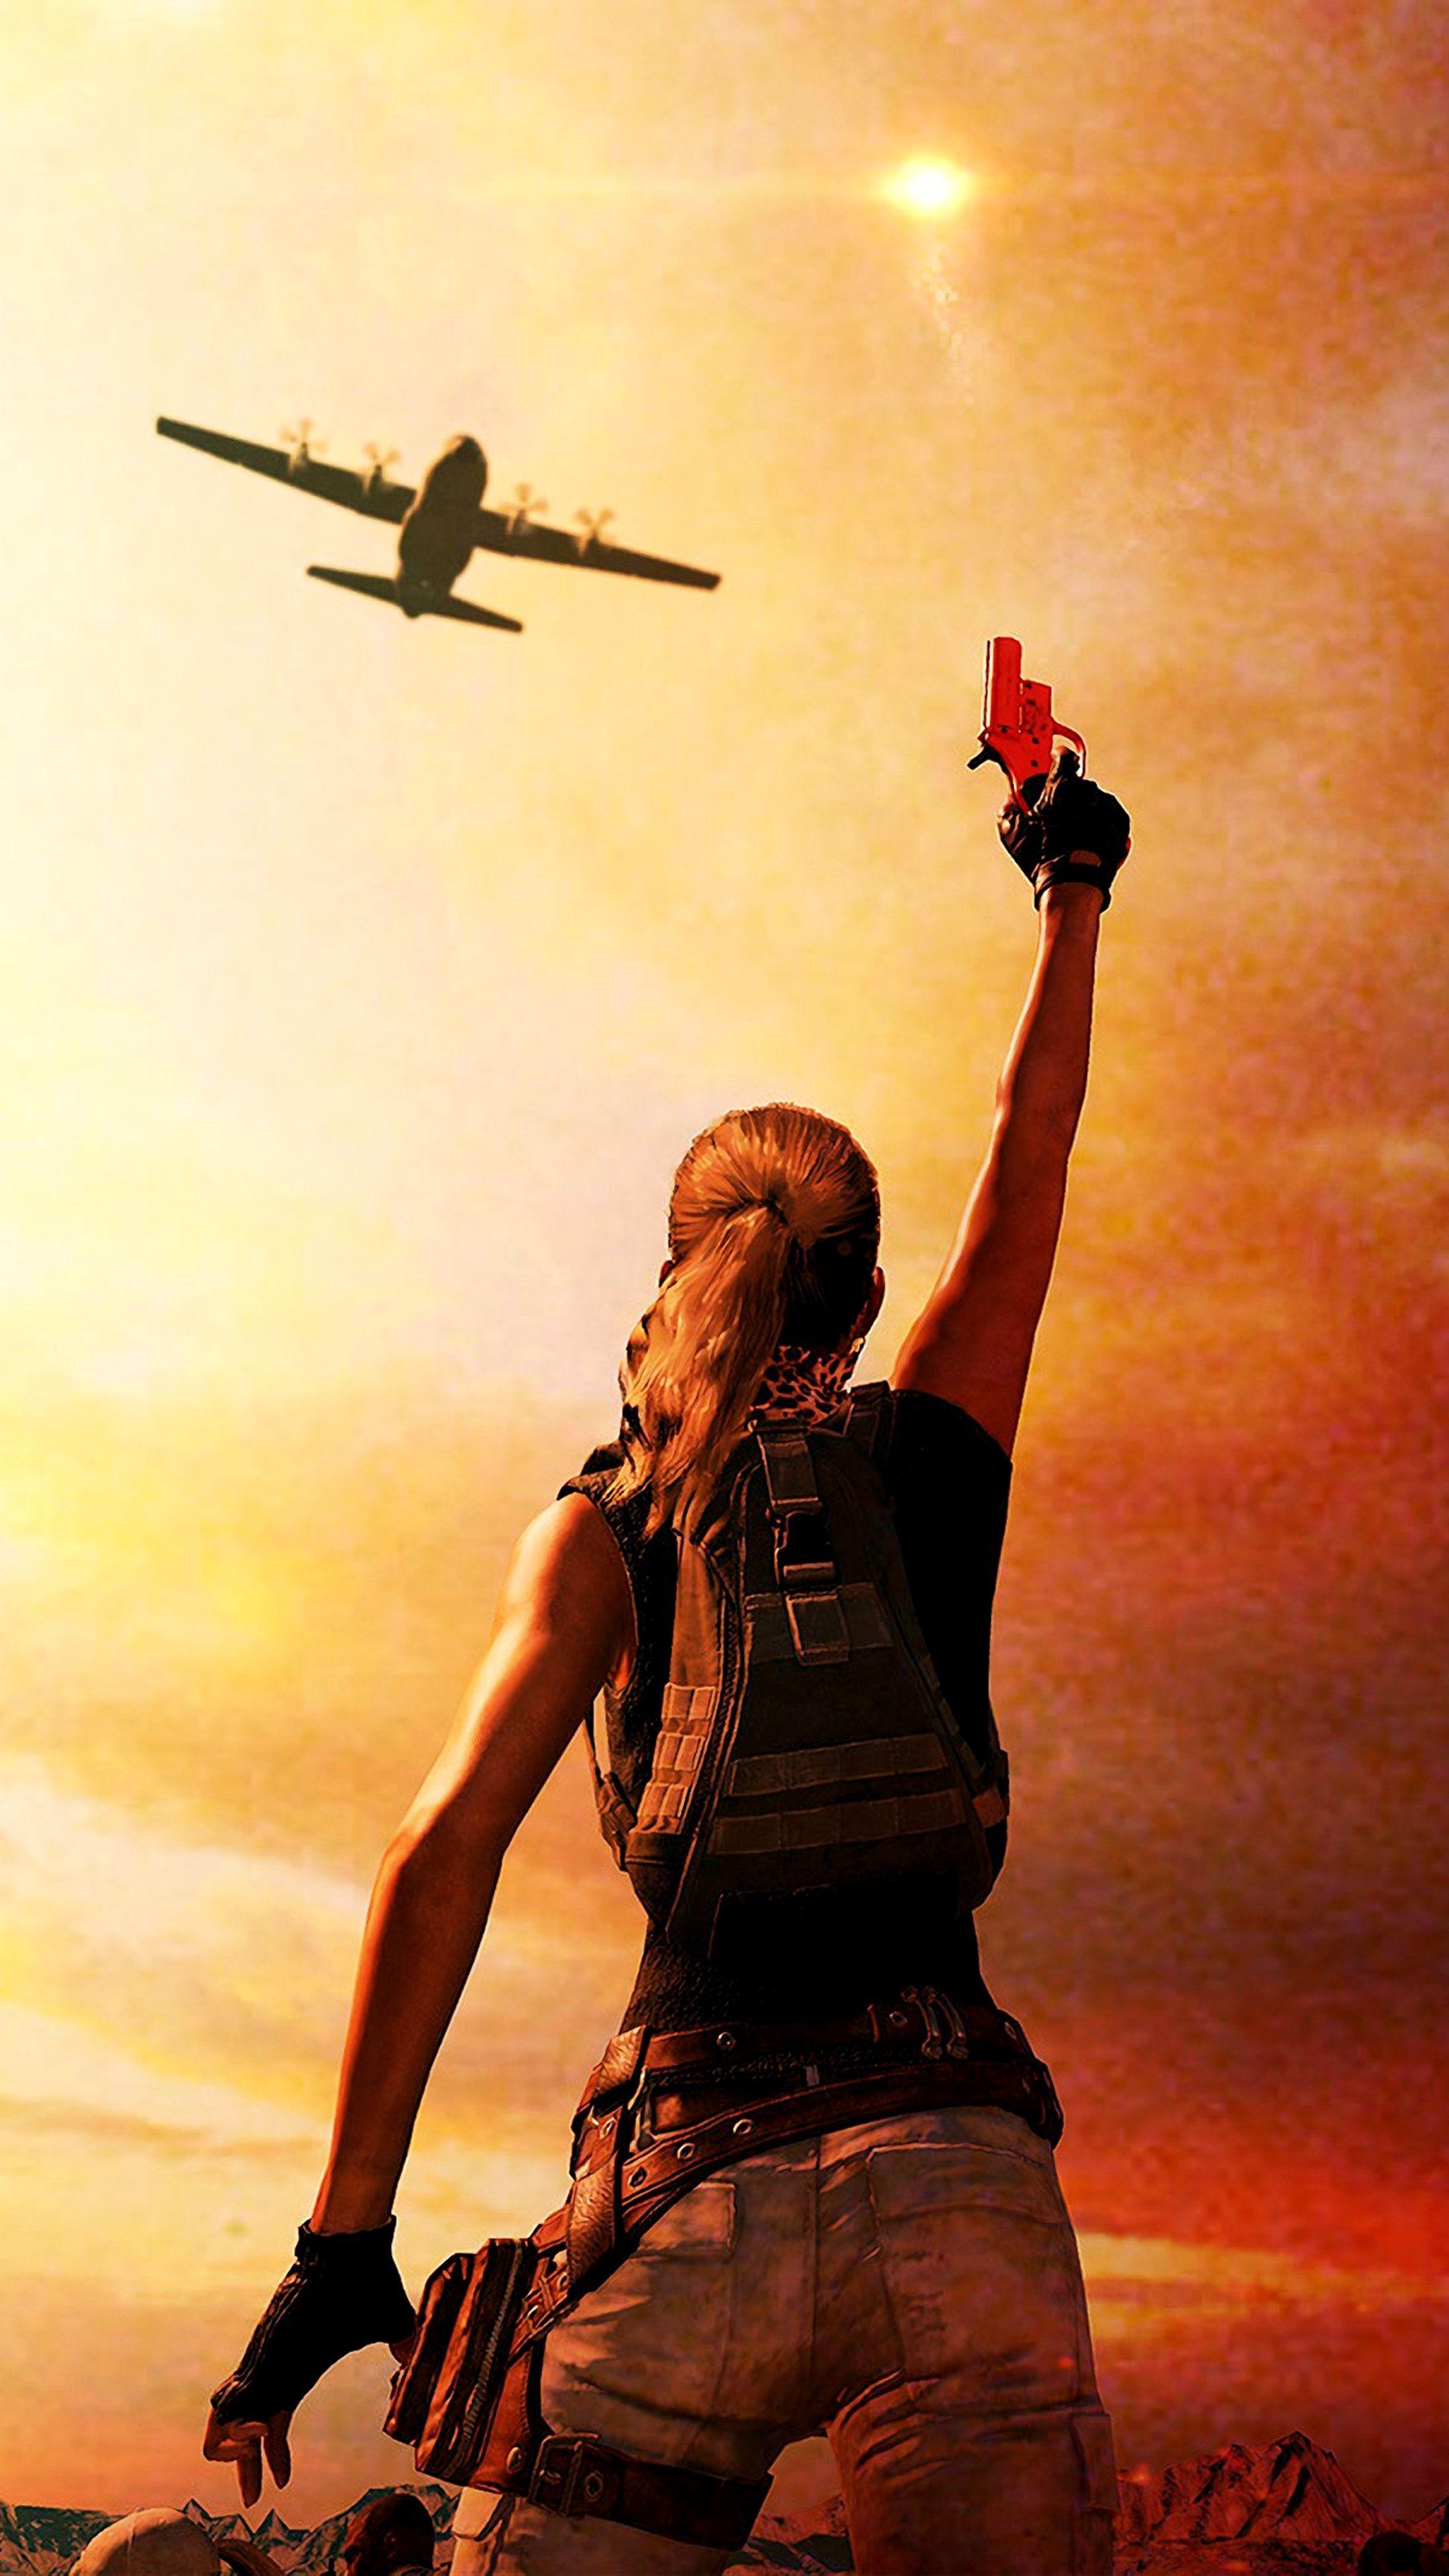 Pubg Wallpaper 4K Hd Download Trick Guns wallpaper